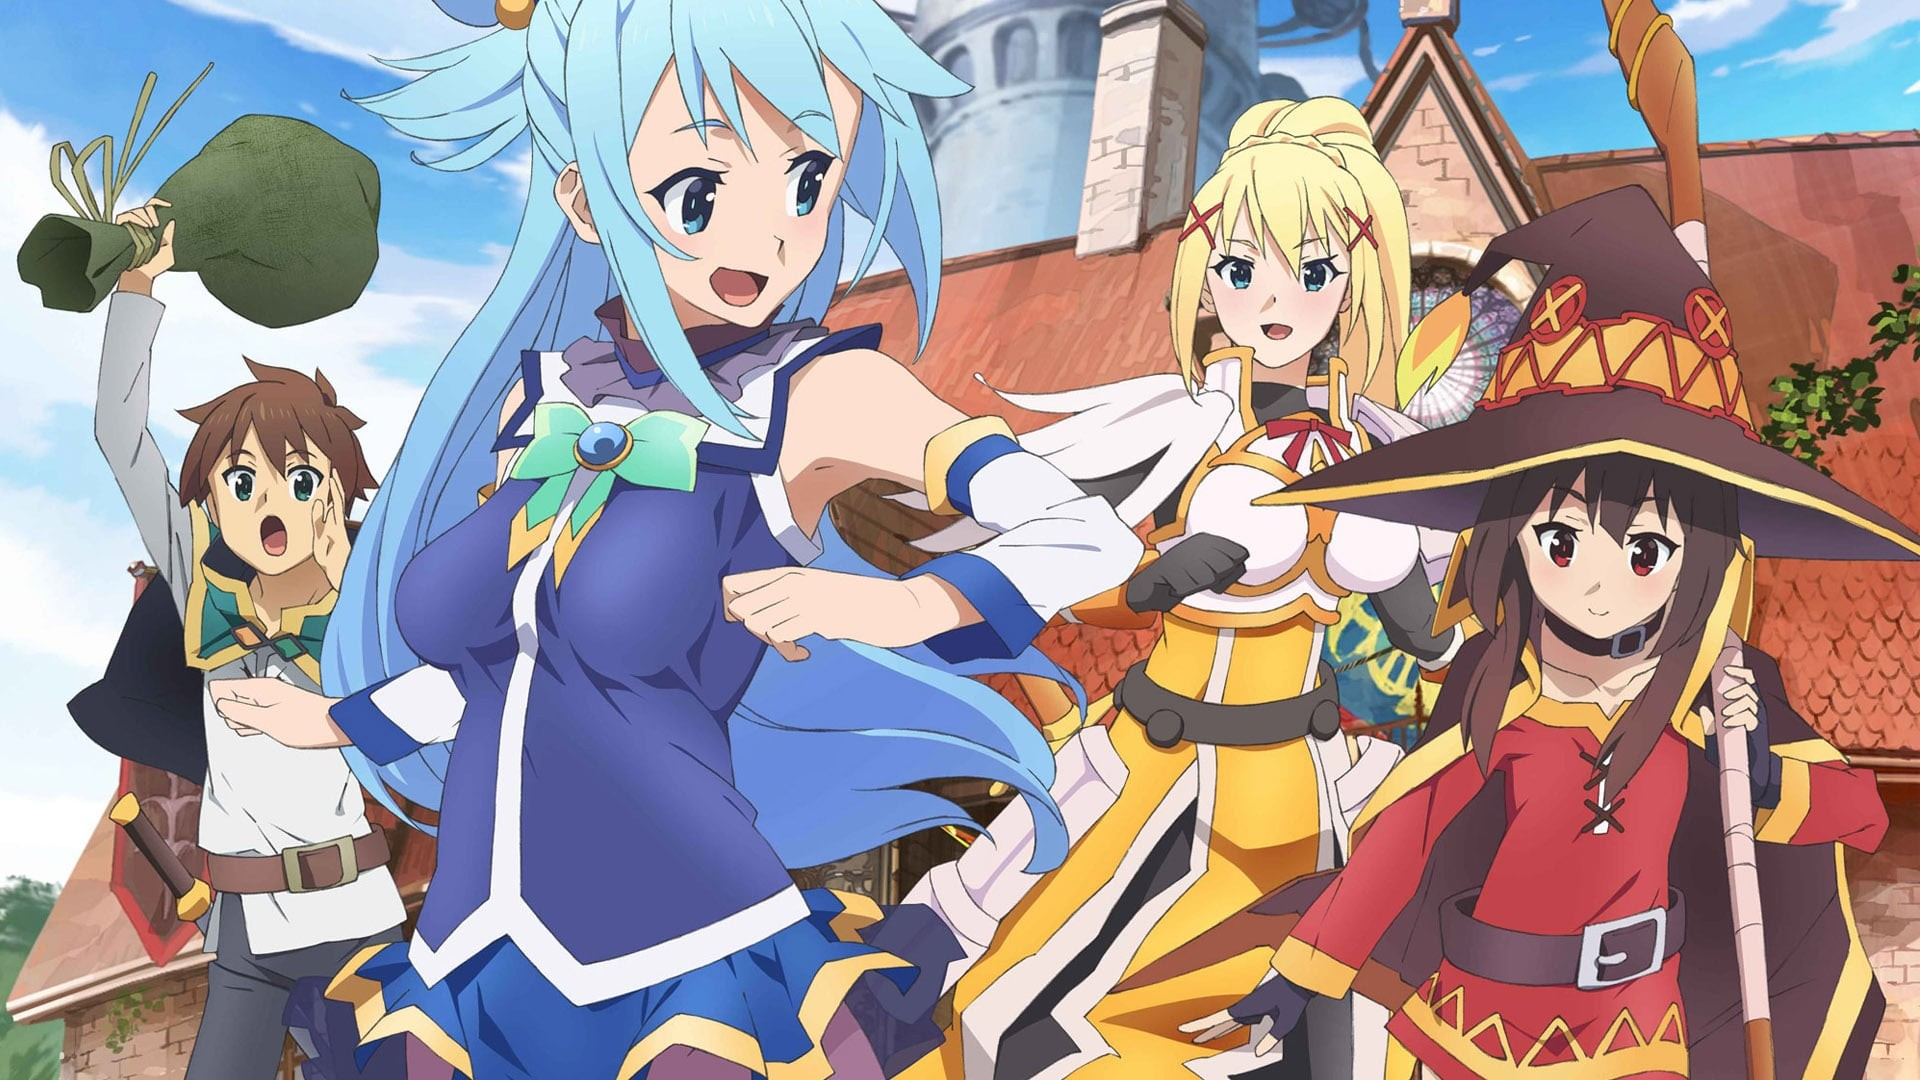 KonoSuba: God's Blessing on This Wonderful World!